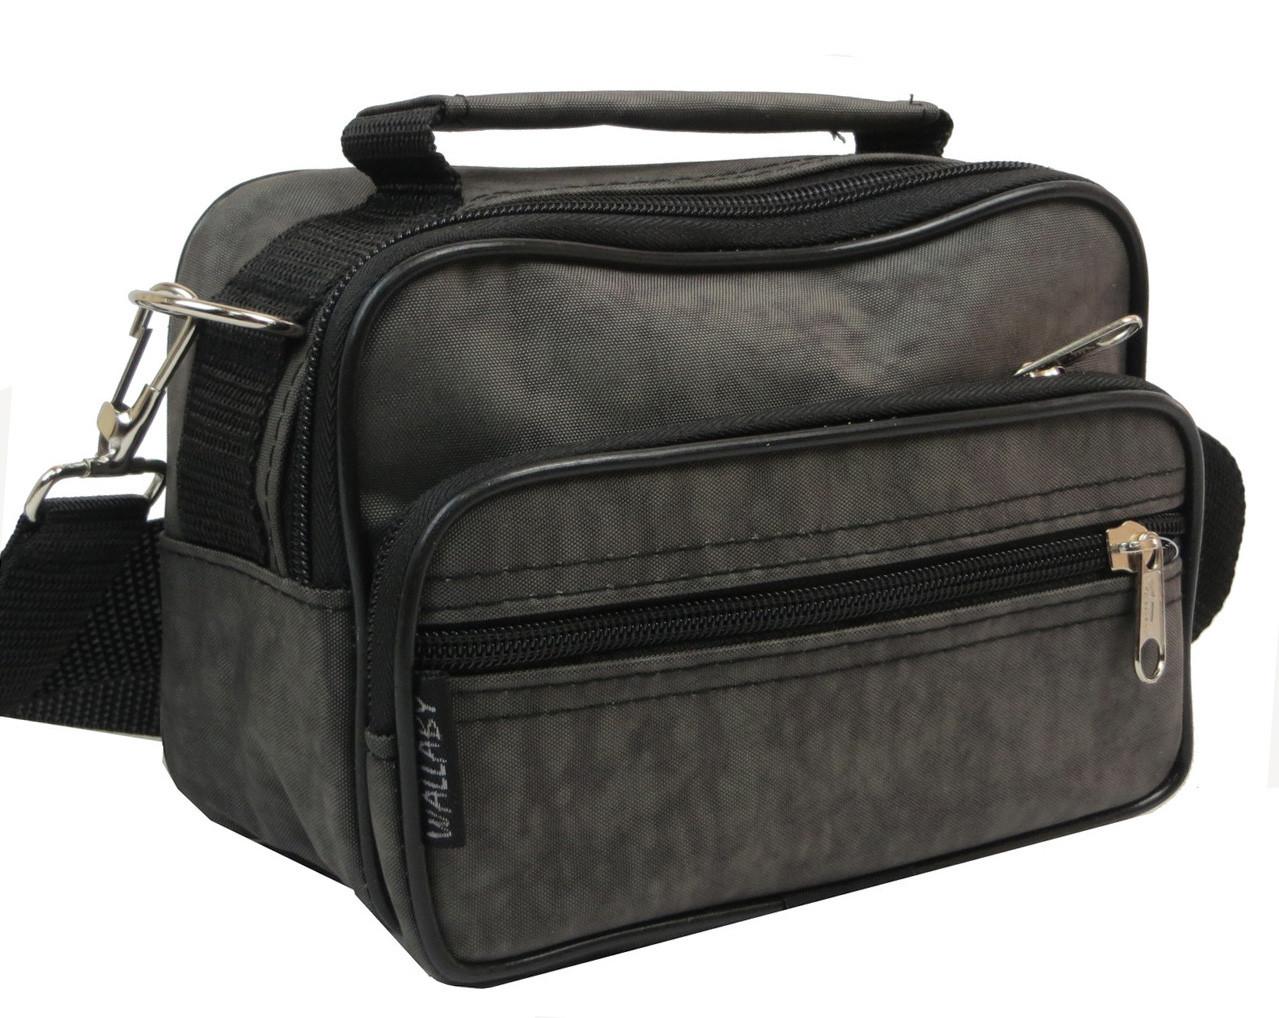 2c466058cc65 Мужская сумка через плечо Wallaby 2663 хаки барсетка на пояс 19х14х7см, цена  128 грн., купить в Харькове — Prom.ua (ID#348415117)